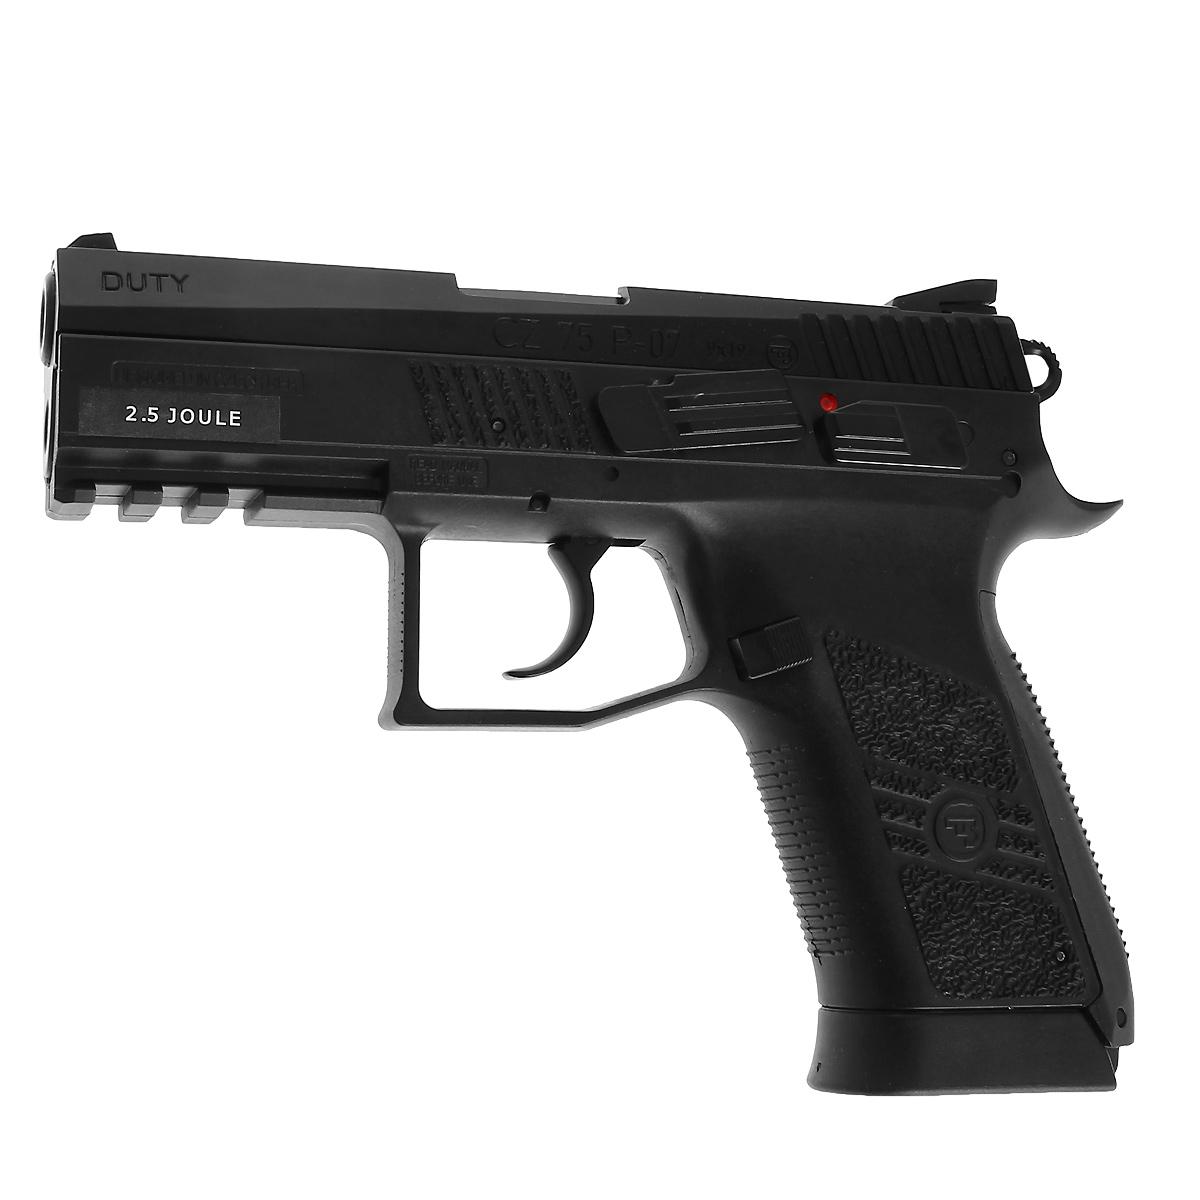 ASG CZ 75 P-07 Duty пистолет пневматический CO2, 4,5 мм, цвет: Black (16726) цена